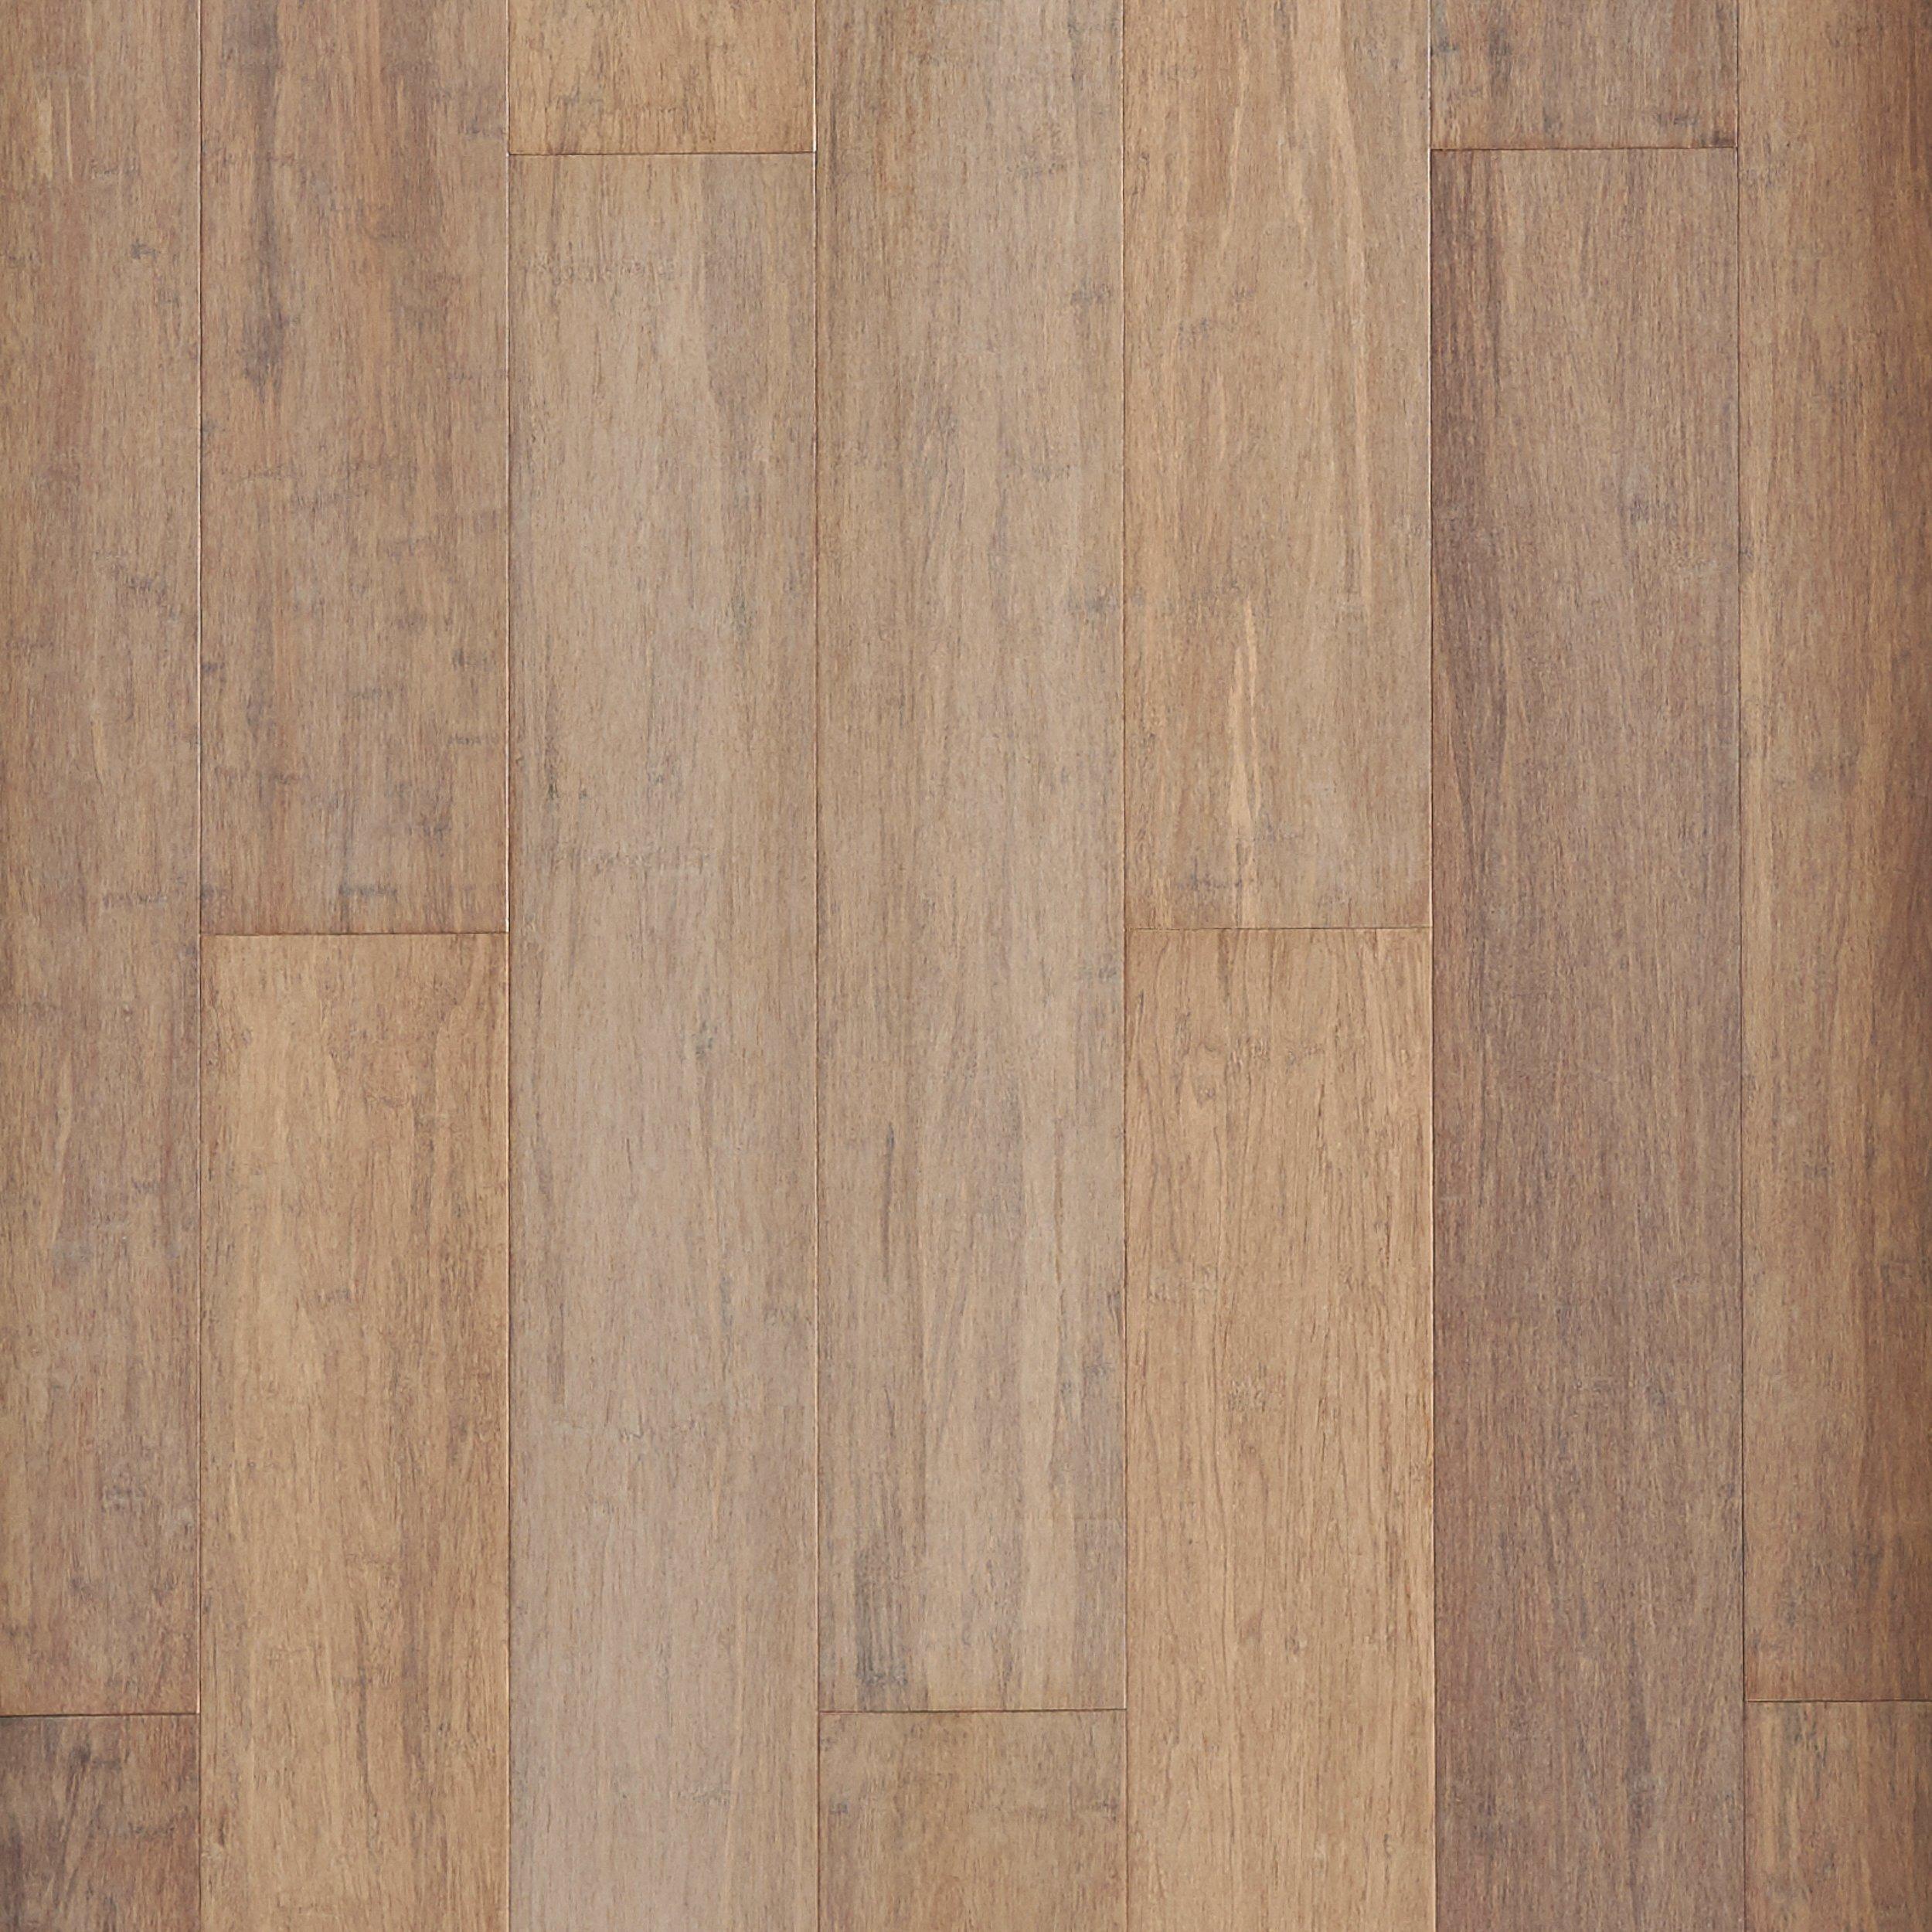 33+ Floor and decor bamboo flooring ideas